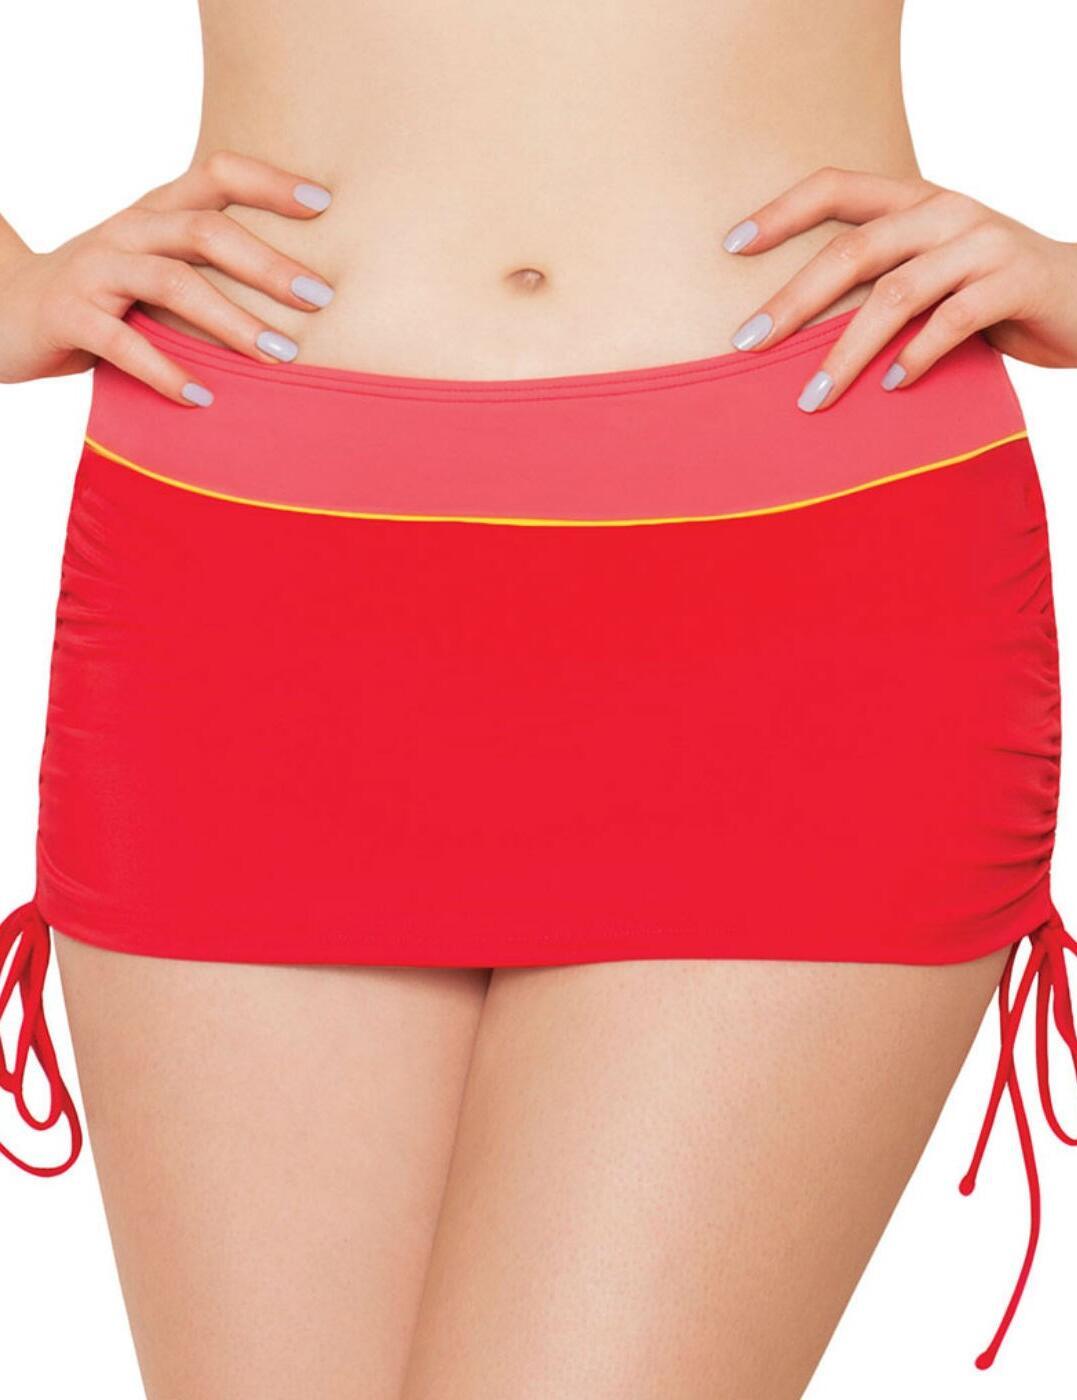 CS3255 Curvy Kate Bon Voyage Adjustable Swim Skirt - CS3255 Swim Skirt